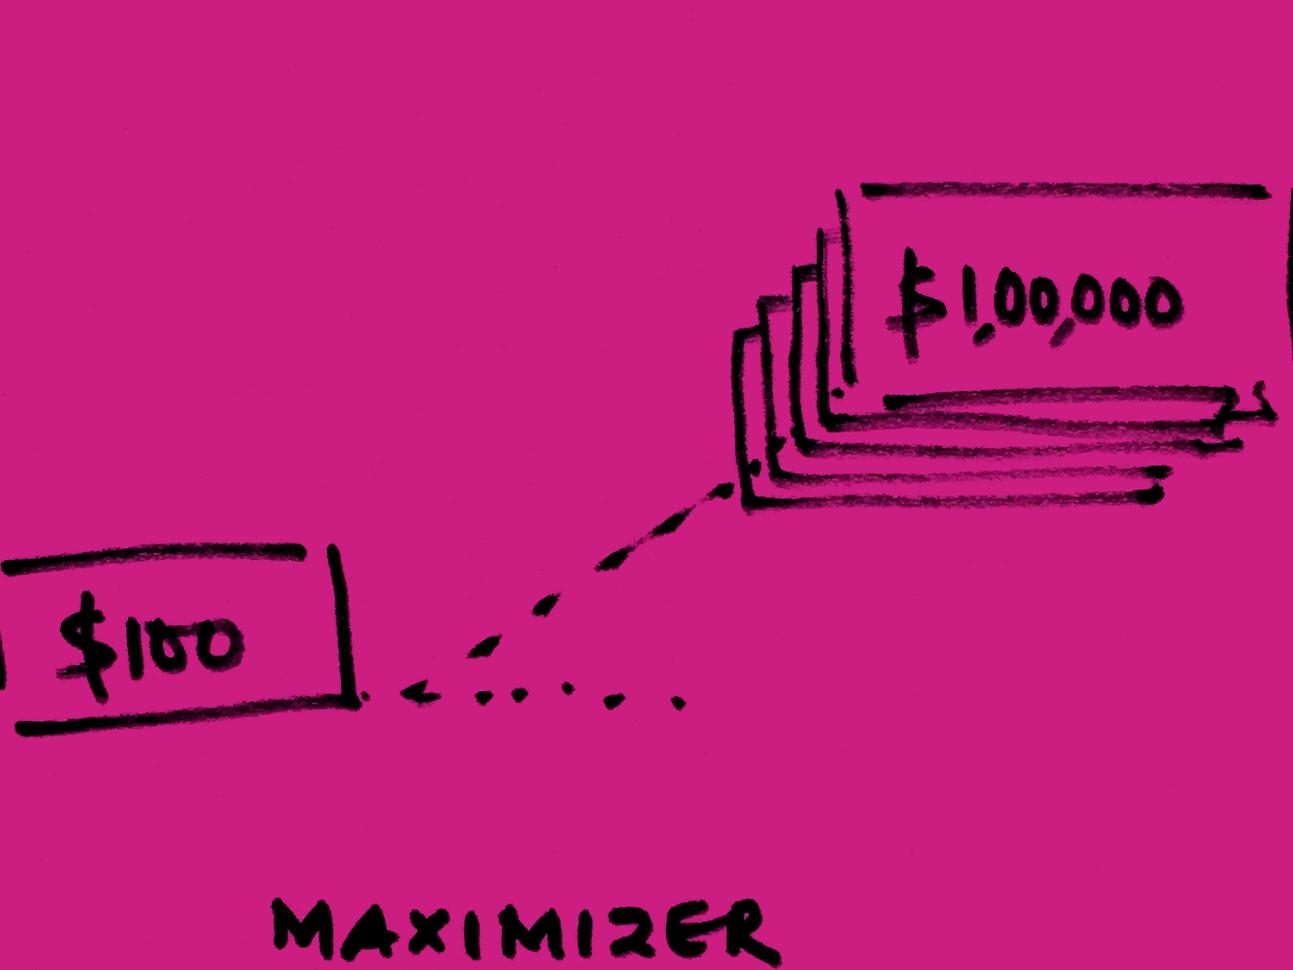 Maximizer StrengthsFinder Singapore Multiply Ten-Fold